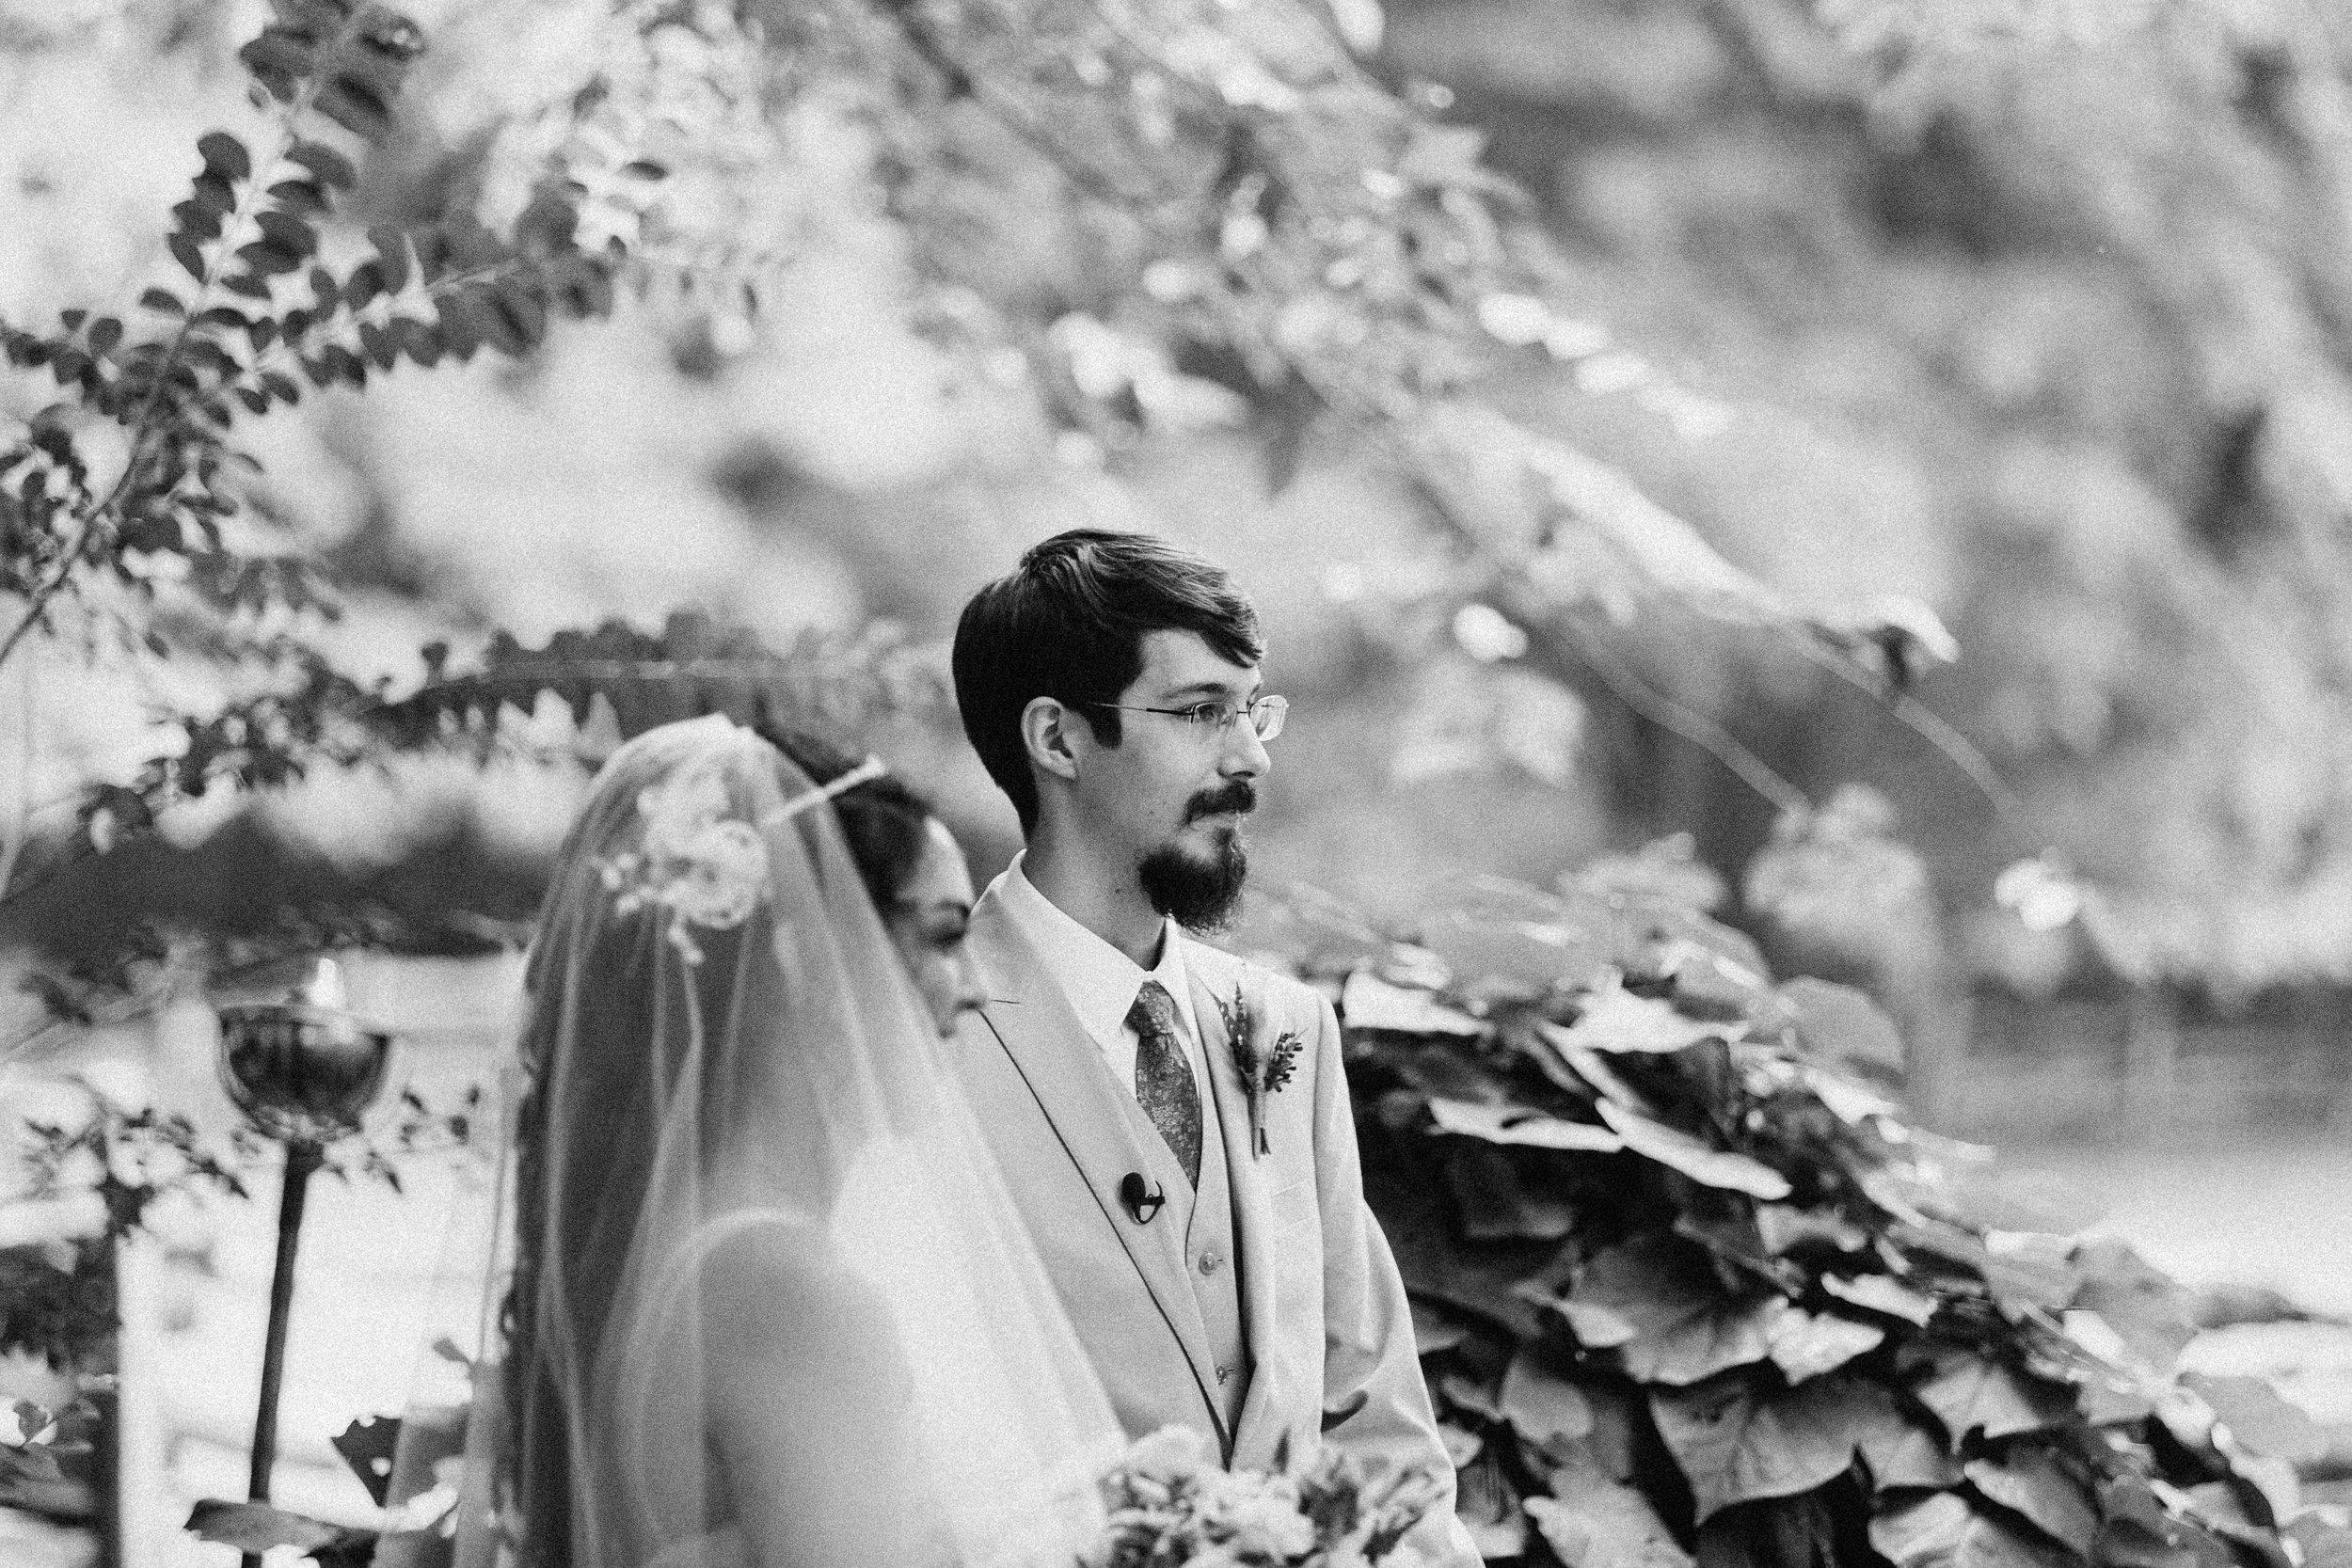 neverland_farms_atlanta_wedding_photographer_documentary_river_west_1692.jpg